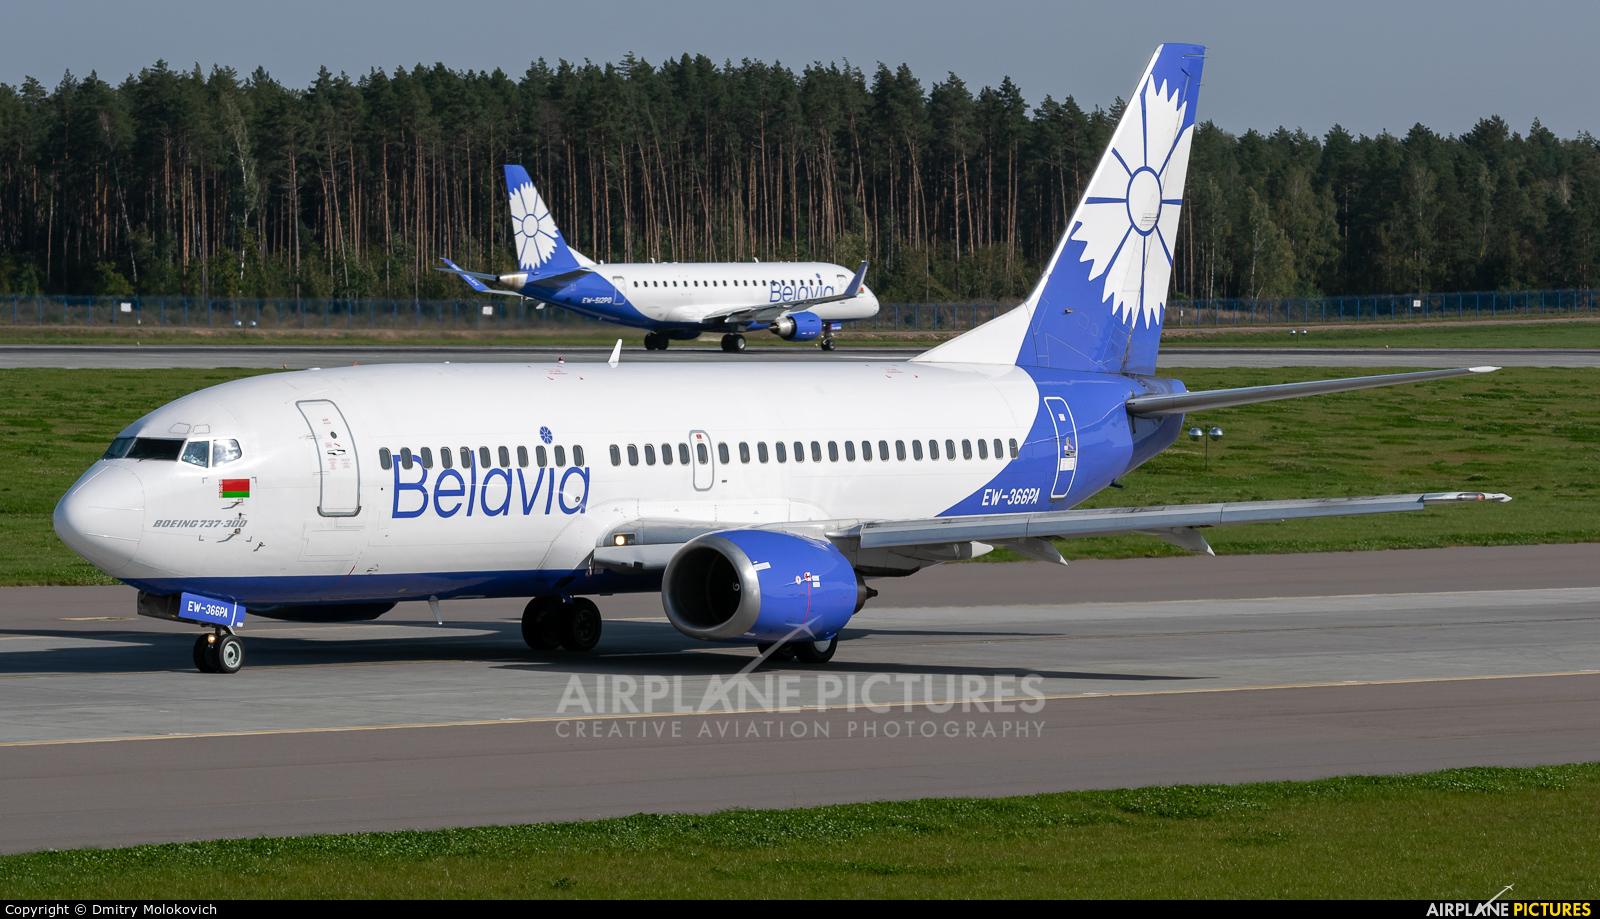 Belavia EW-366PA aircraft at Minsk Intl